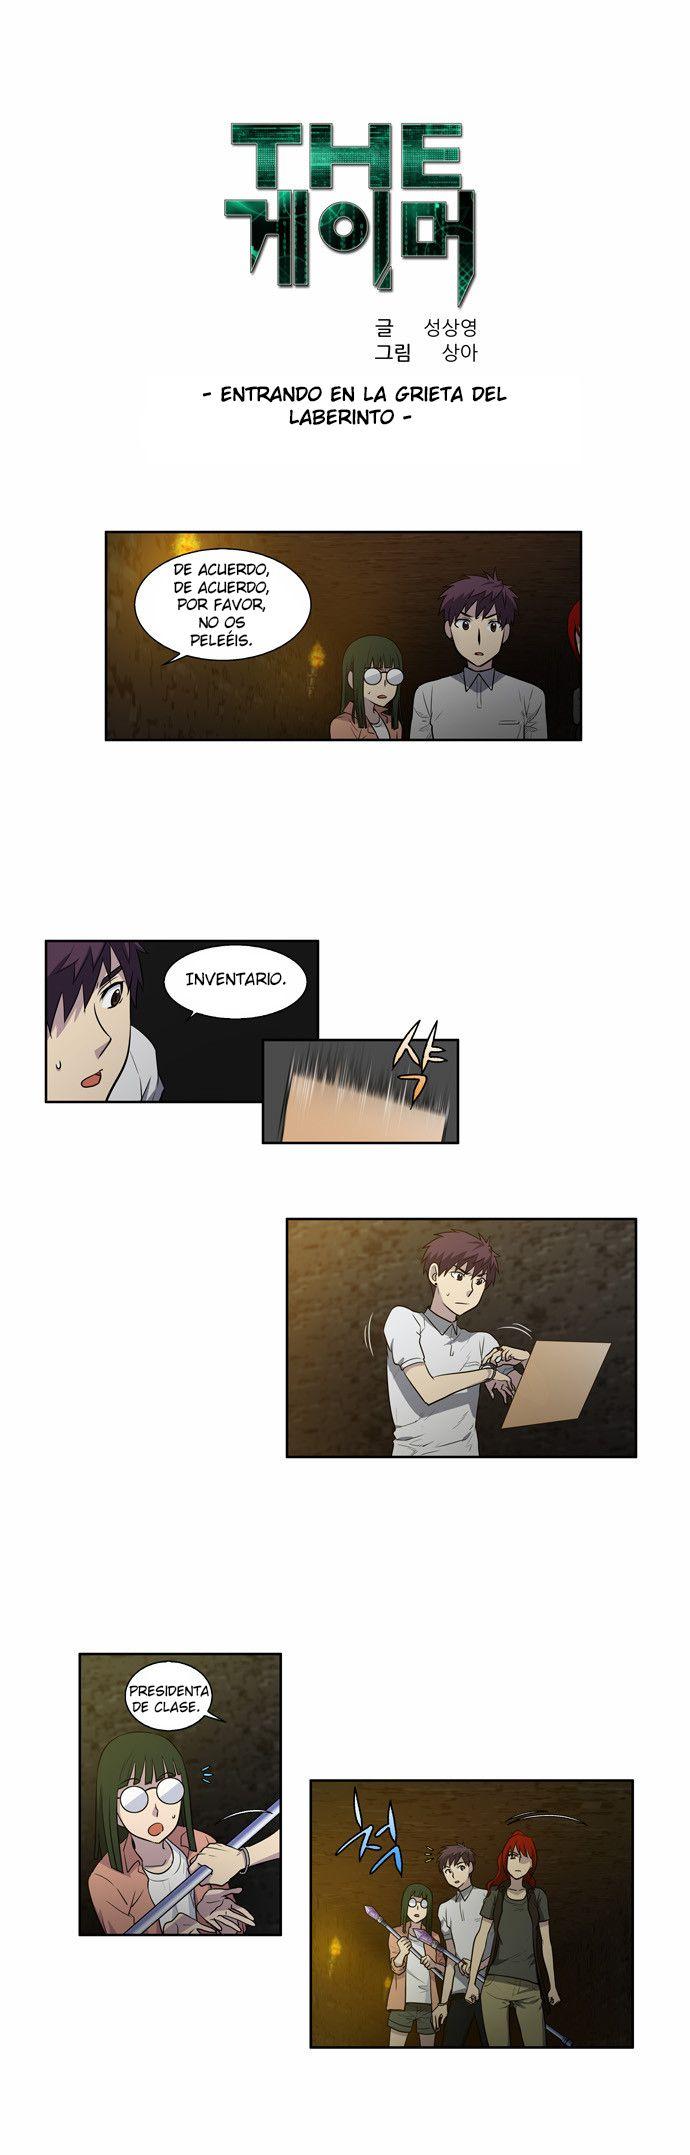 https://c5.ninemanga.com/es_manga/61/1725/479869/7f09ca11be963a091d5de2c2647889c9.jpg Page 2